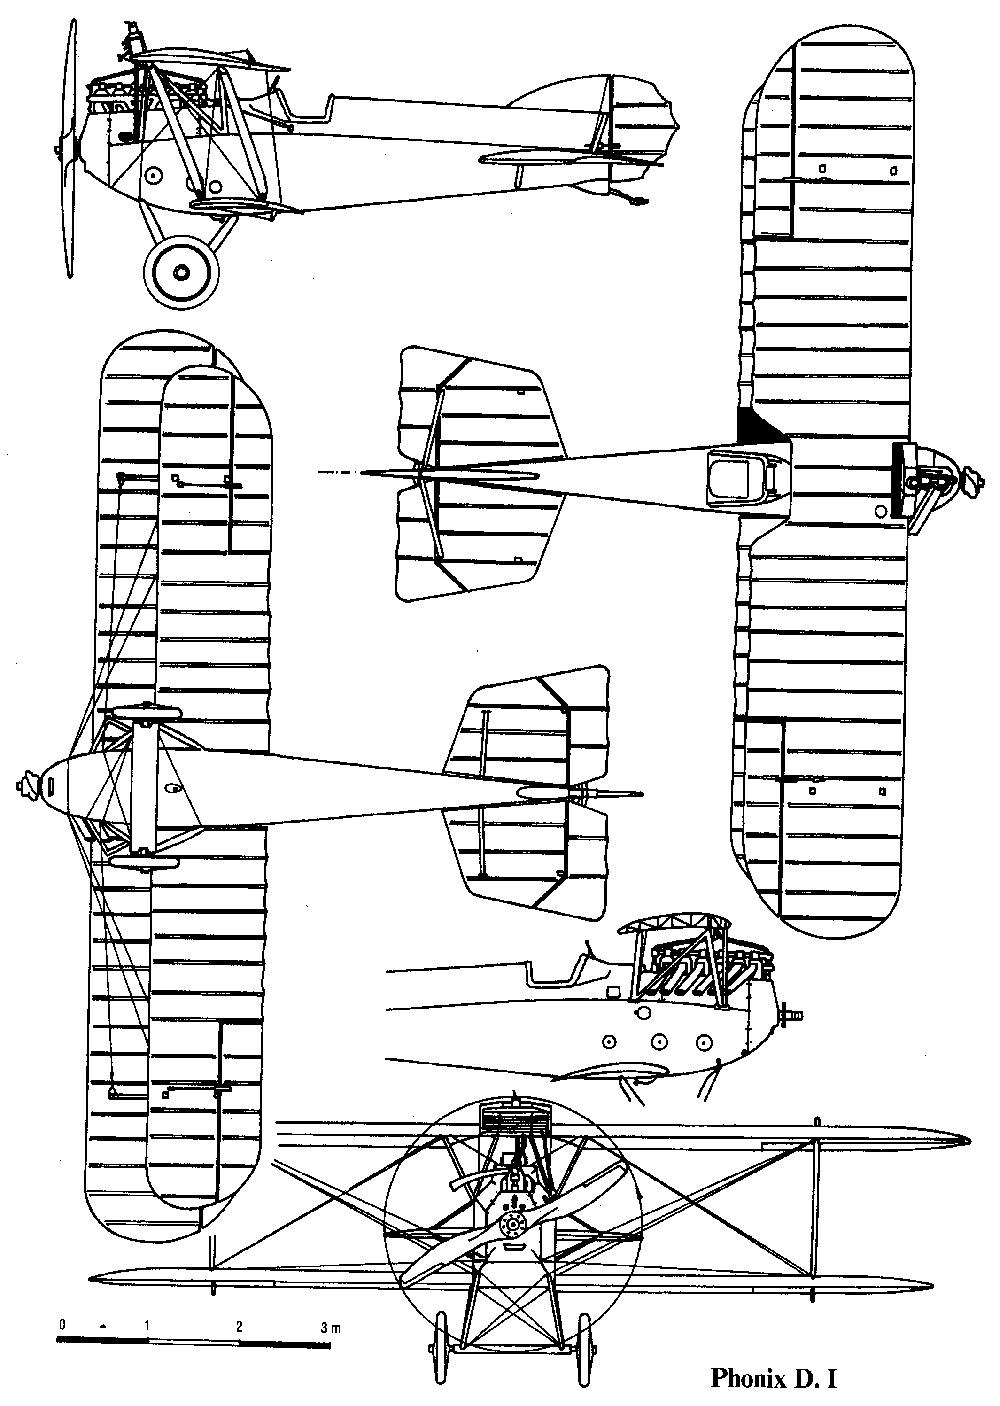 Чертеж австро-венгерского истребителя 'Феникс D.I'